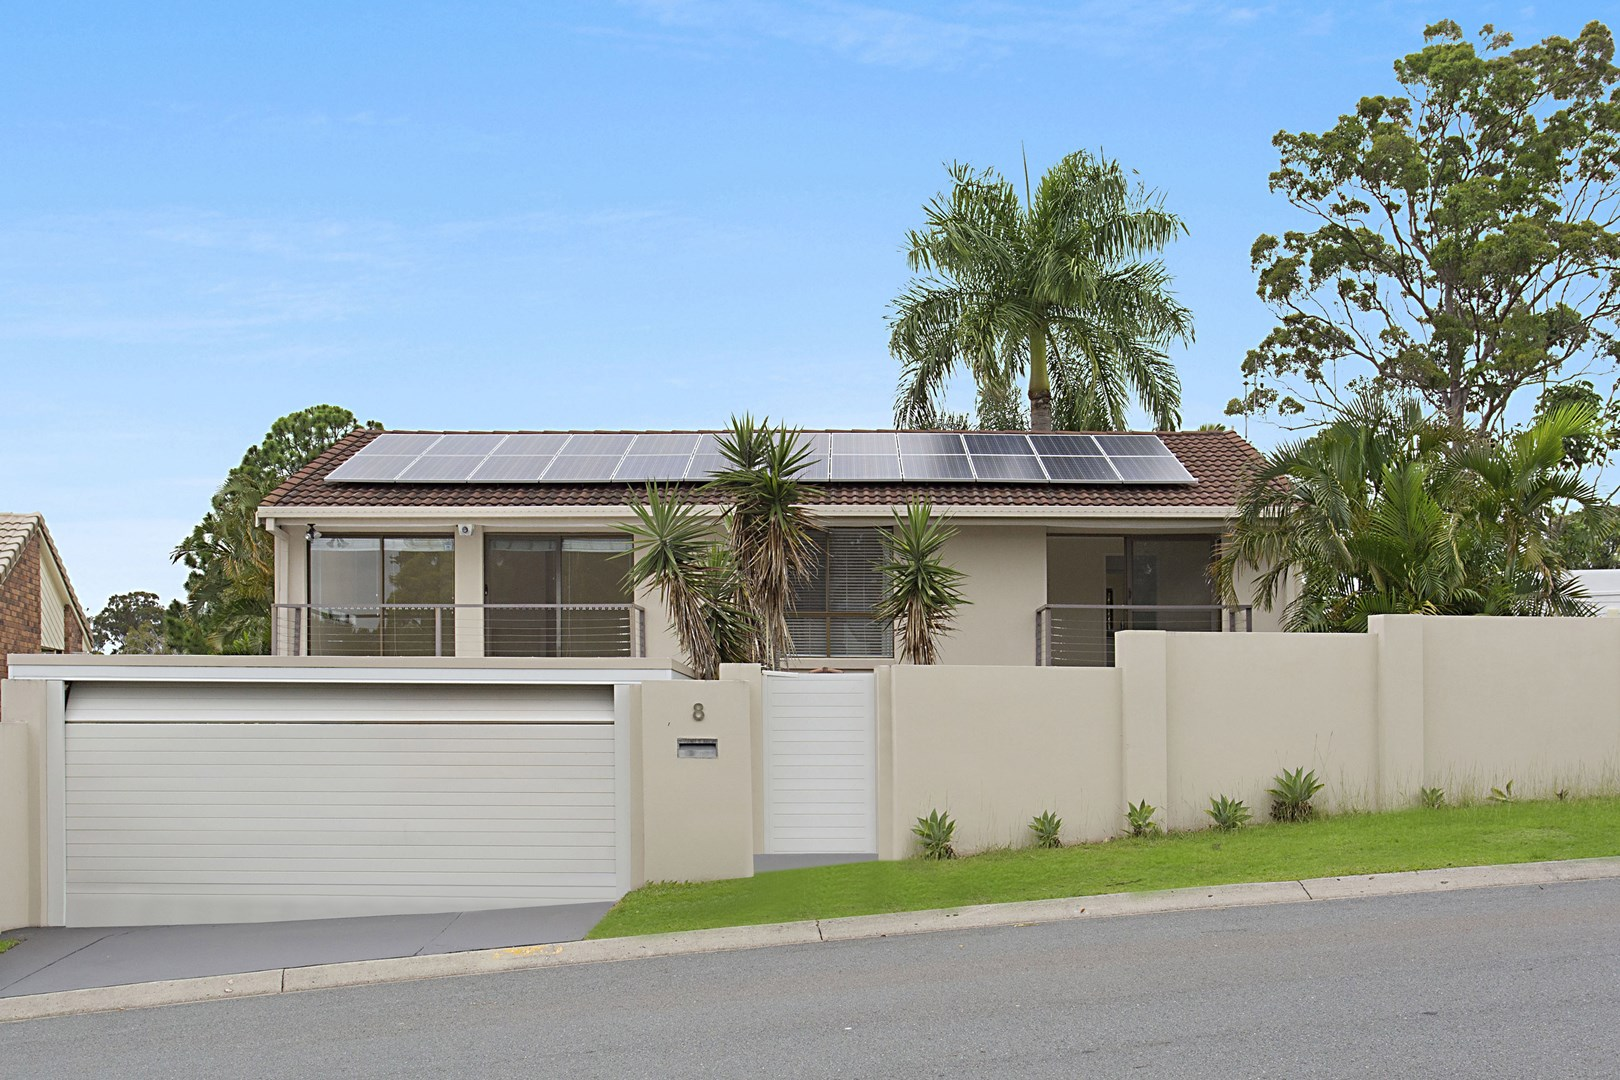 8 Sandringham Drive, Robina QLD 4226, Image 0